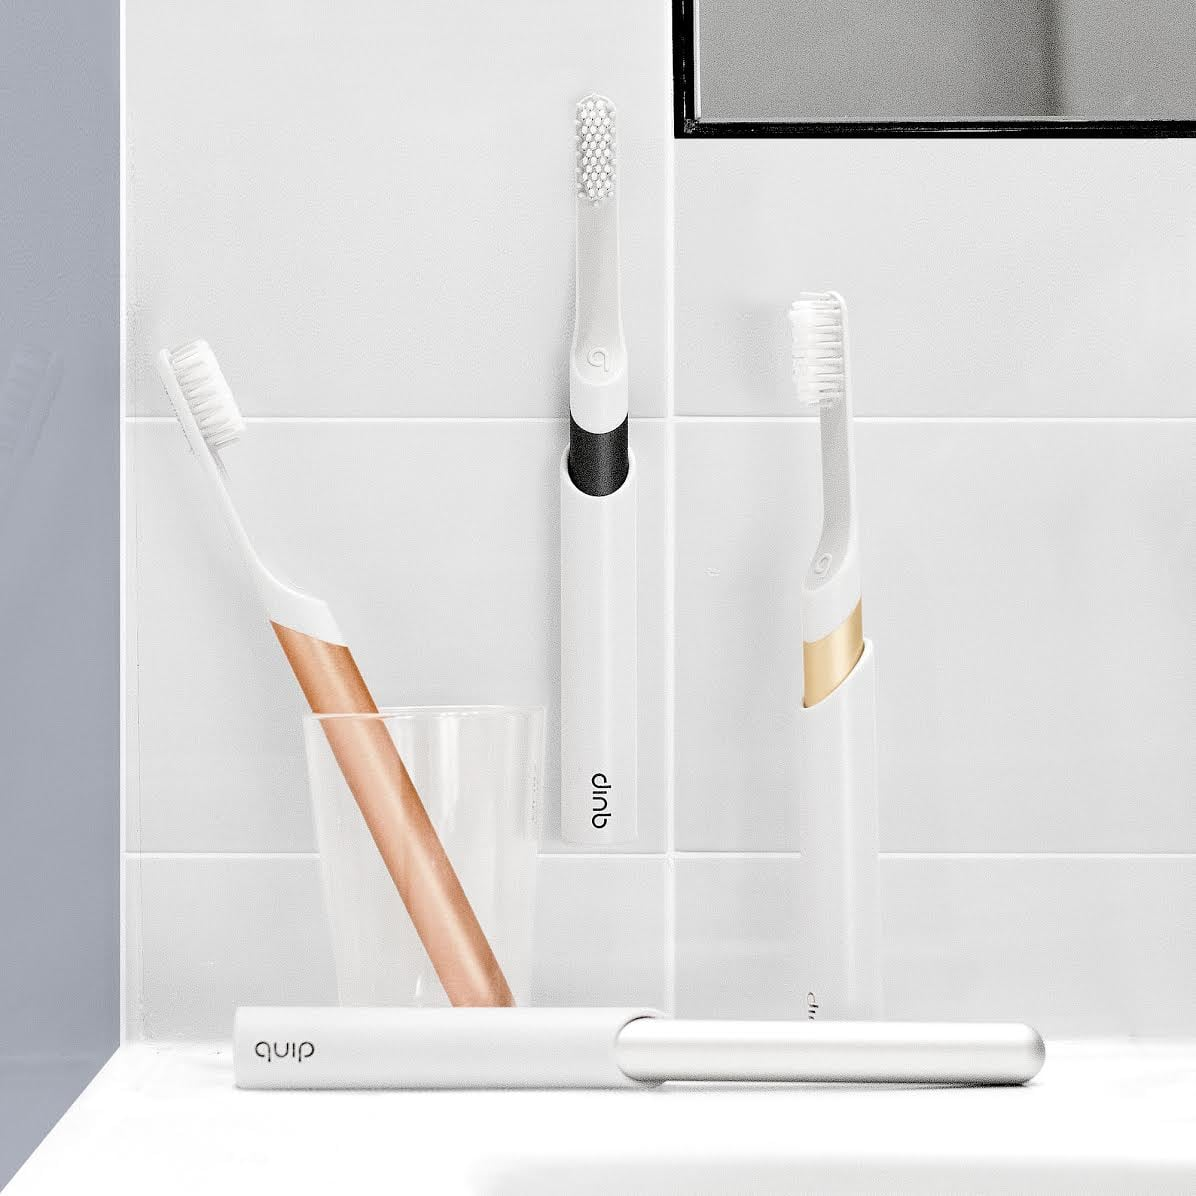 Quip Toothbrush Review Popsugar Smart Living